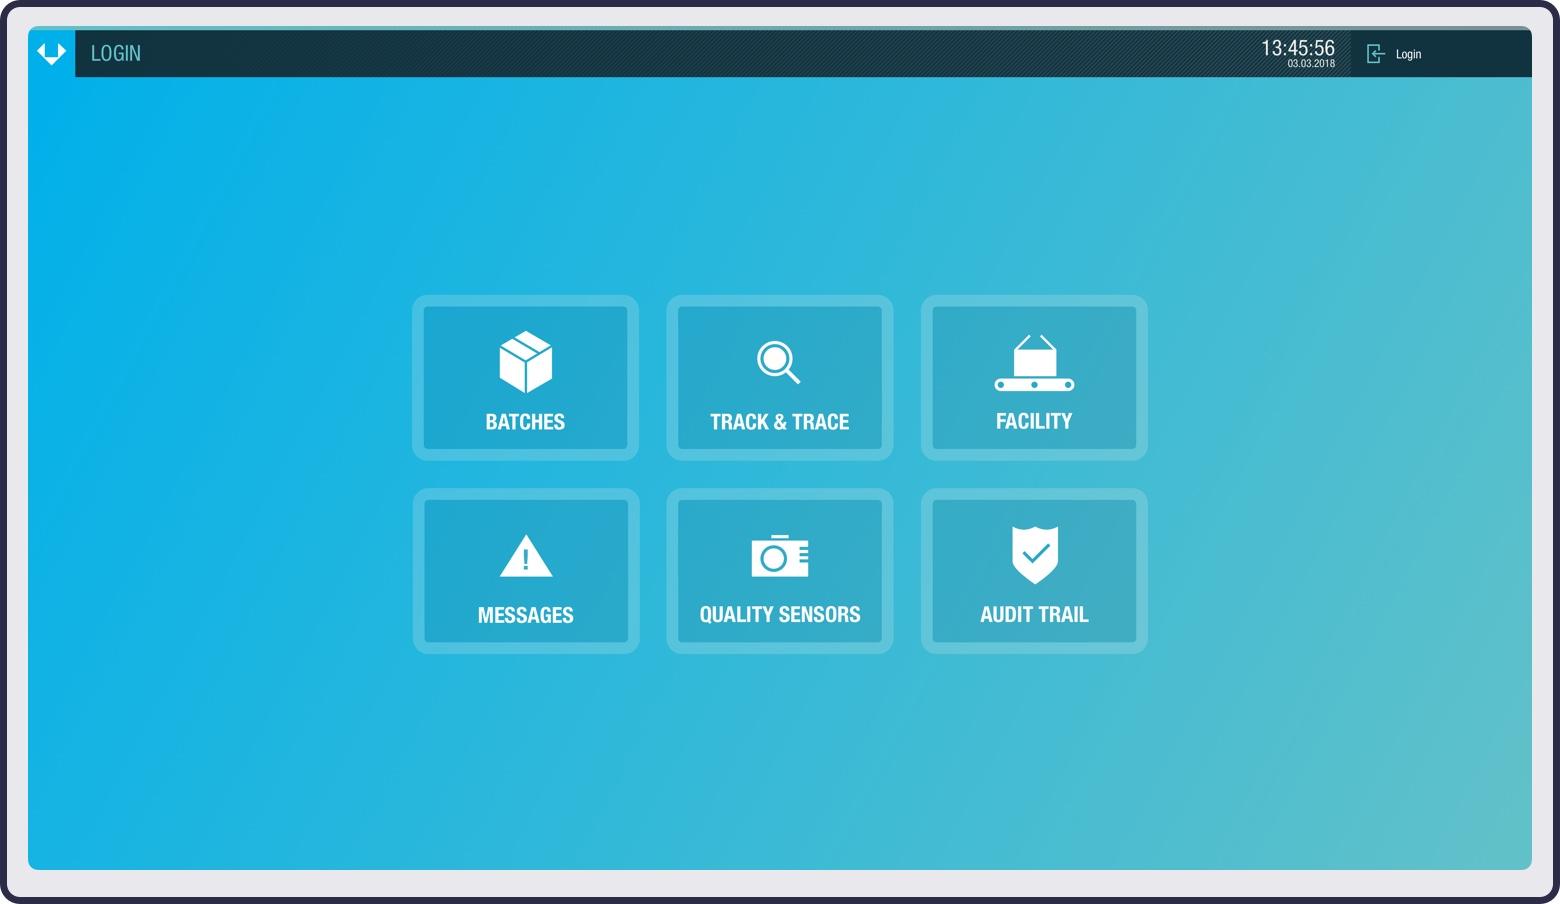 Screenshot of the control panel's main menu